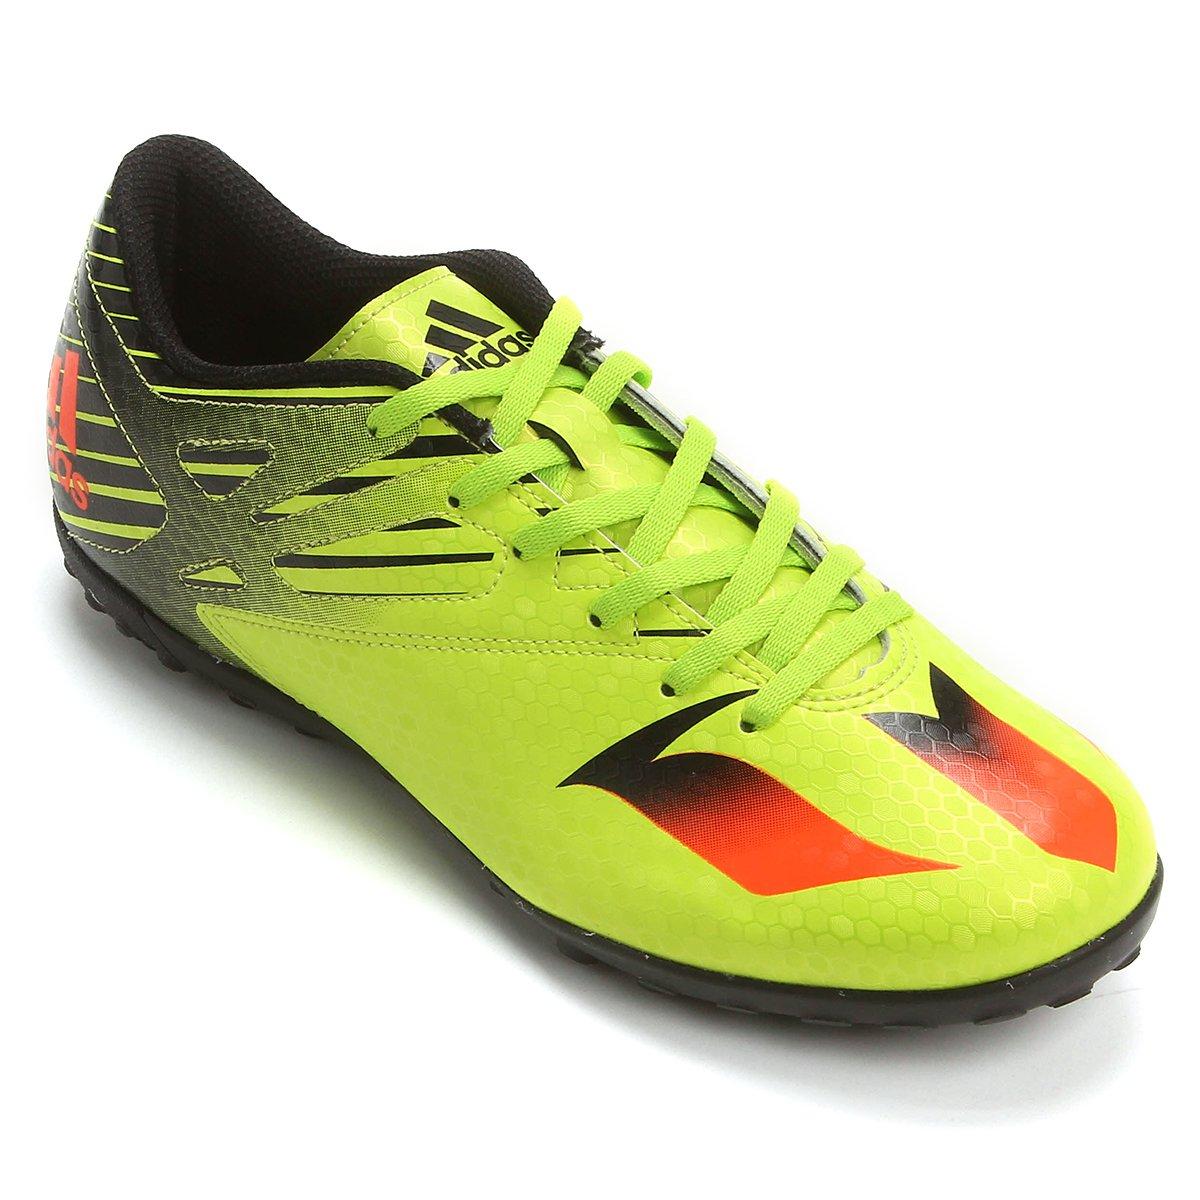 ecb19eeae3658 Chuteira Society Adidas Messi 15.4 TF Masculina - Compre Agora ...